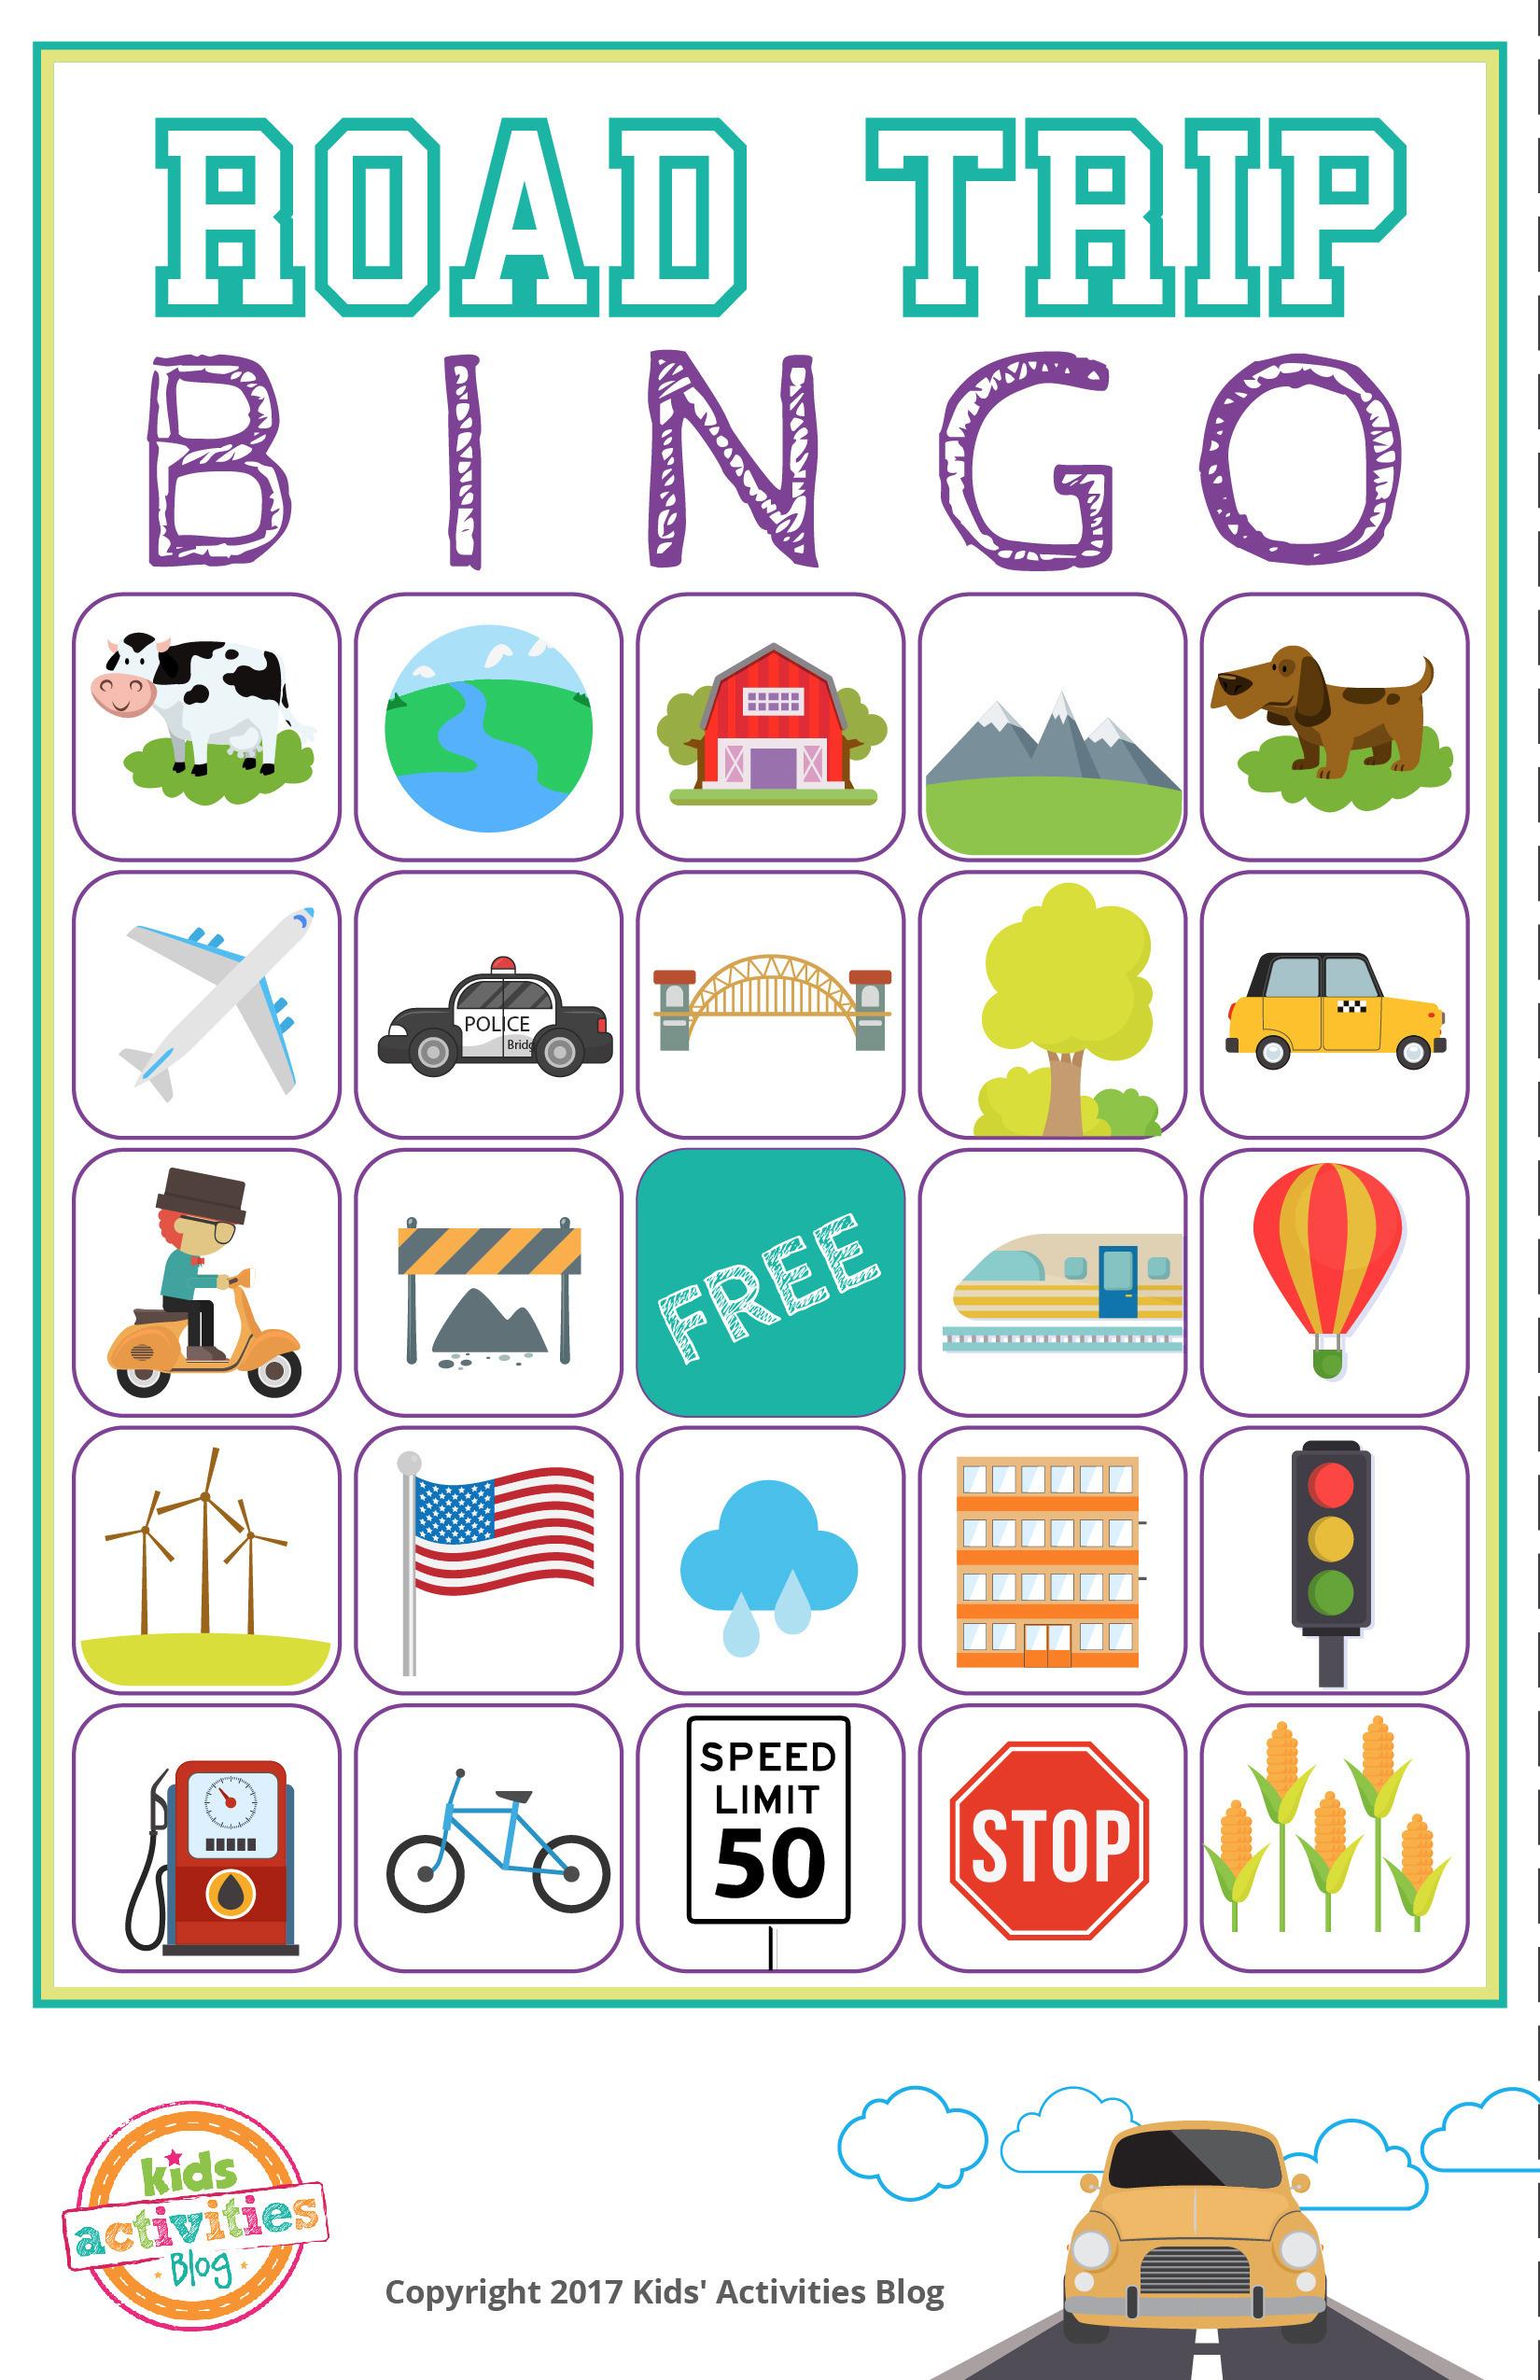 Road Trip Bingo Printable Game - Free Download Of 6 Travel